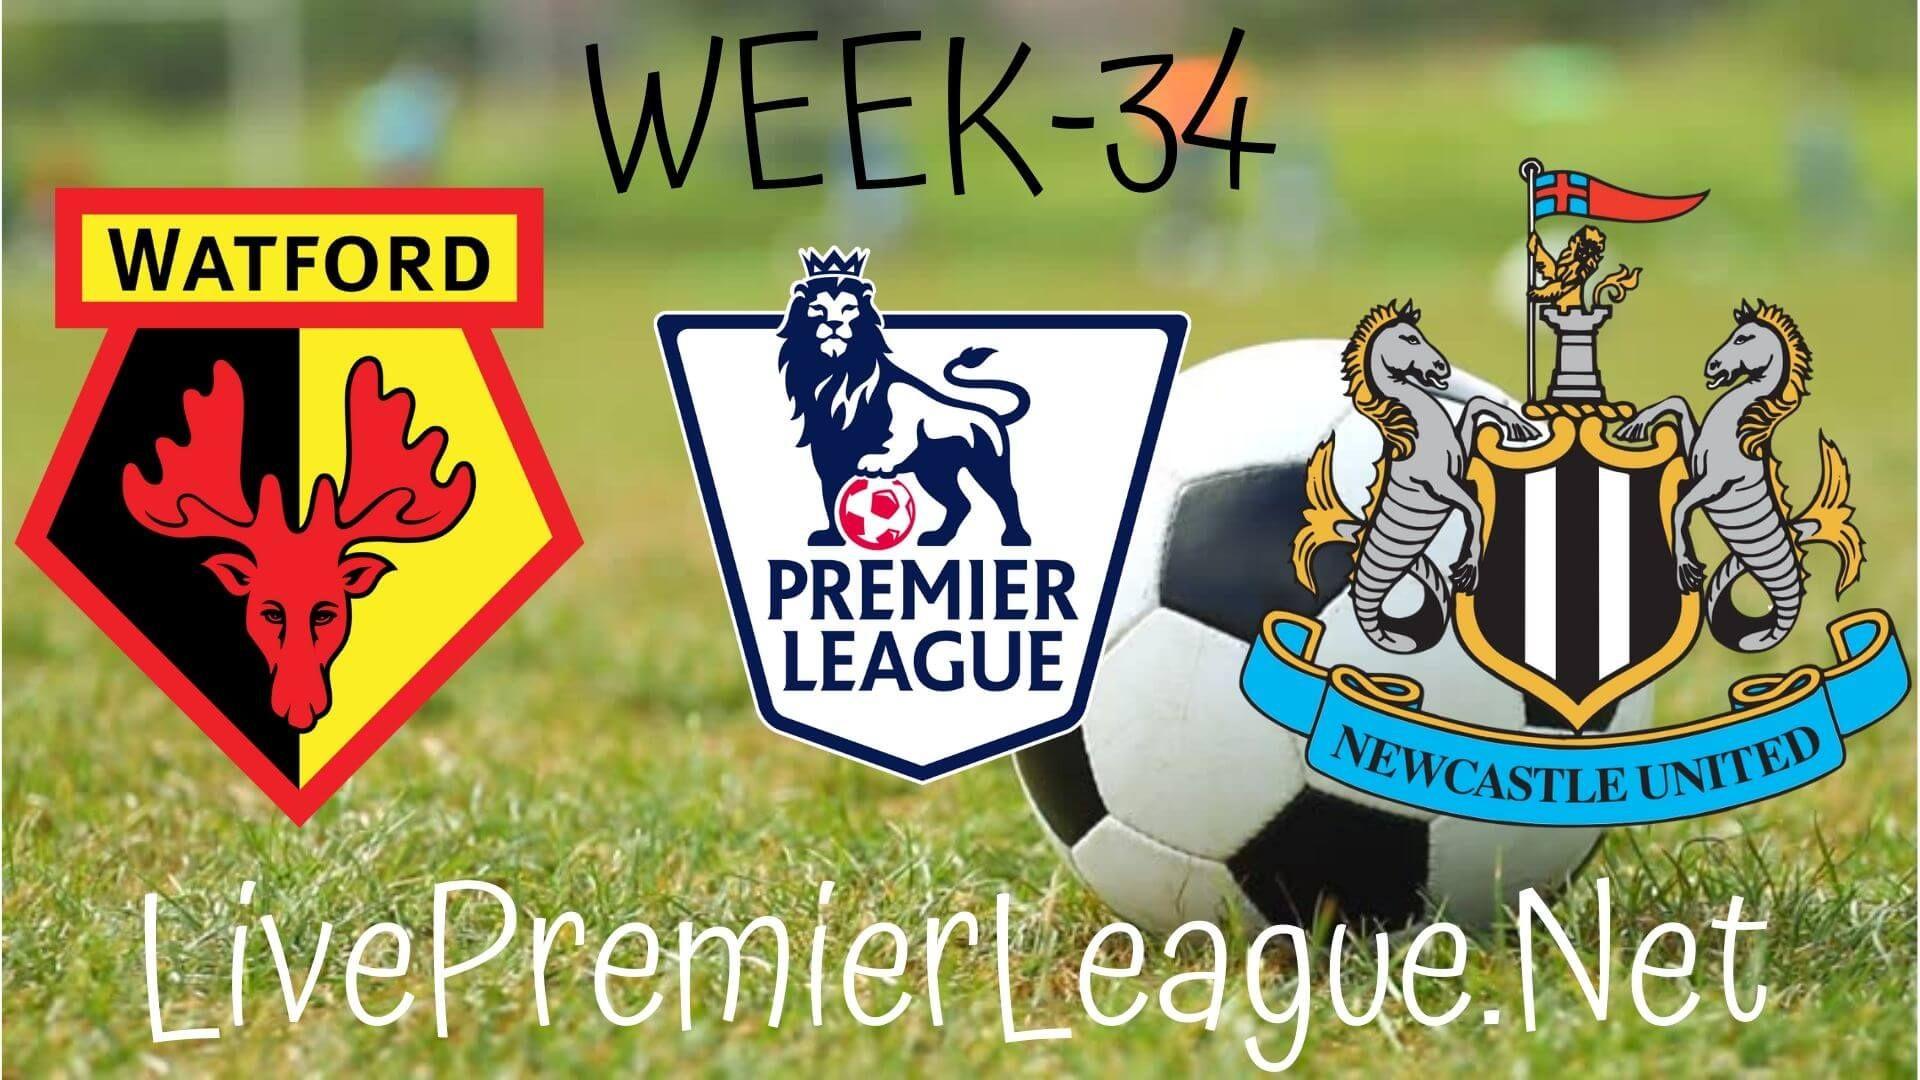 Watford Vs Newcastle United Live Stream Epl Week 35 In 2020 Newcastle United Newcastle English Premier League